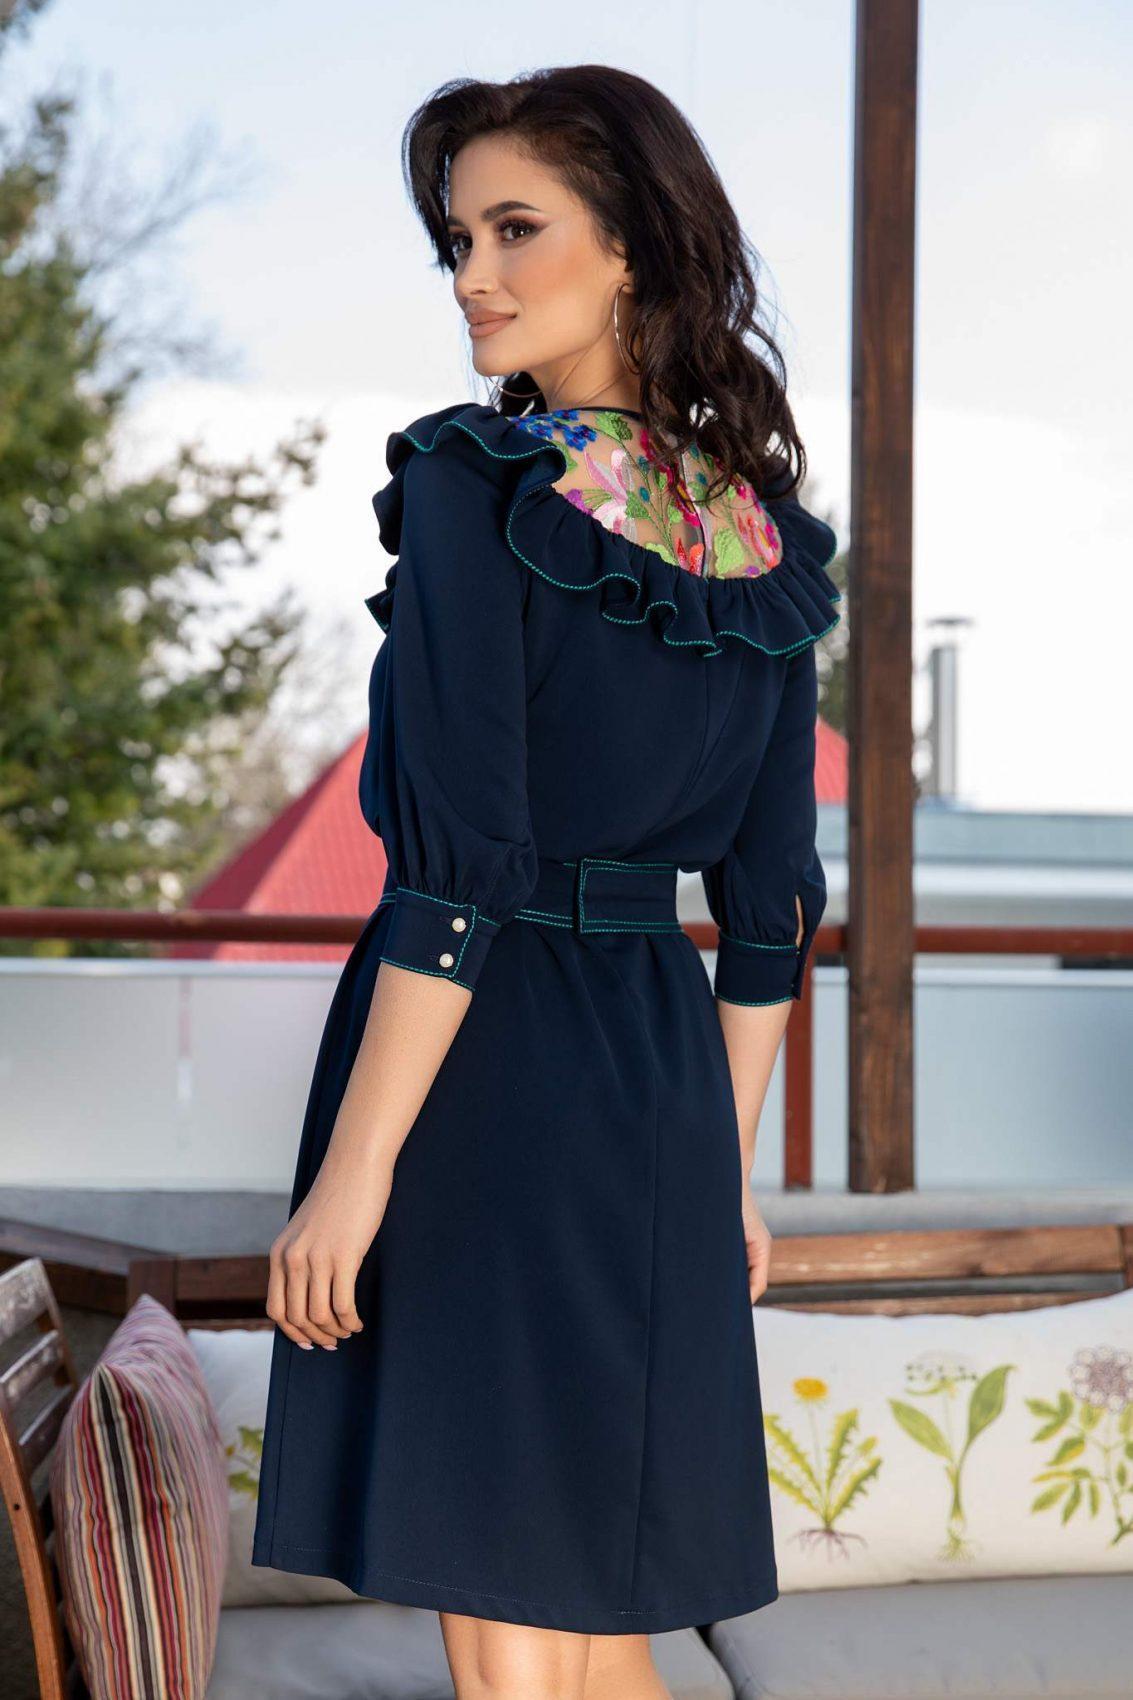 La Donna Louanna Navy Μπλε Φορεμα 3122